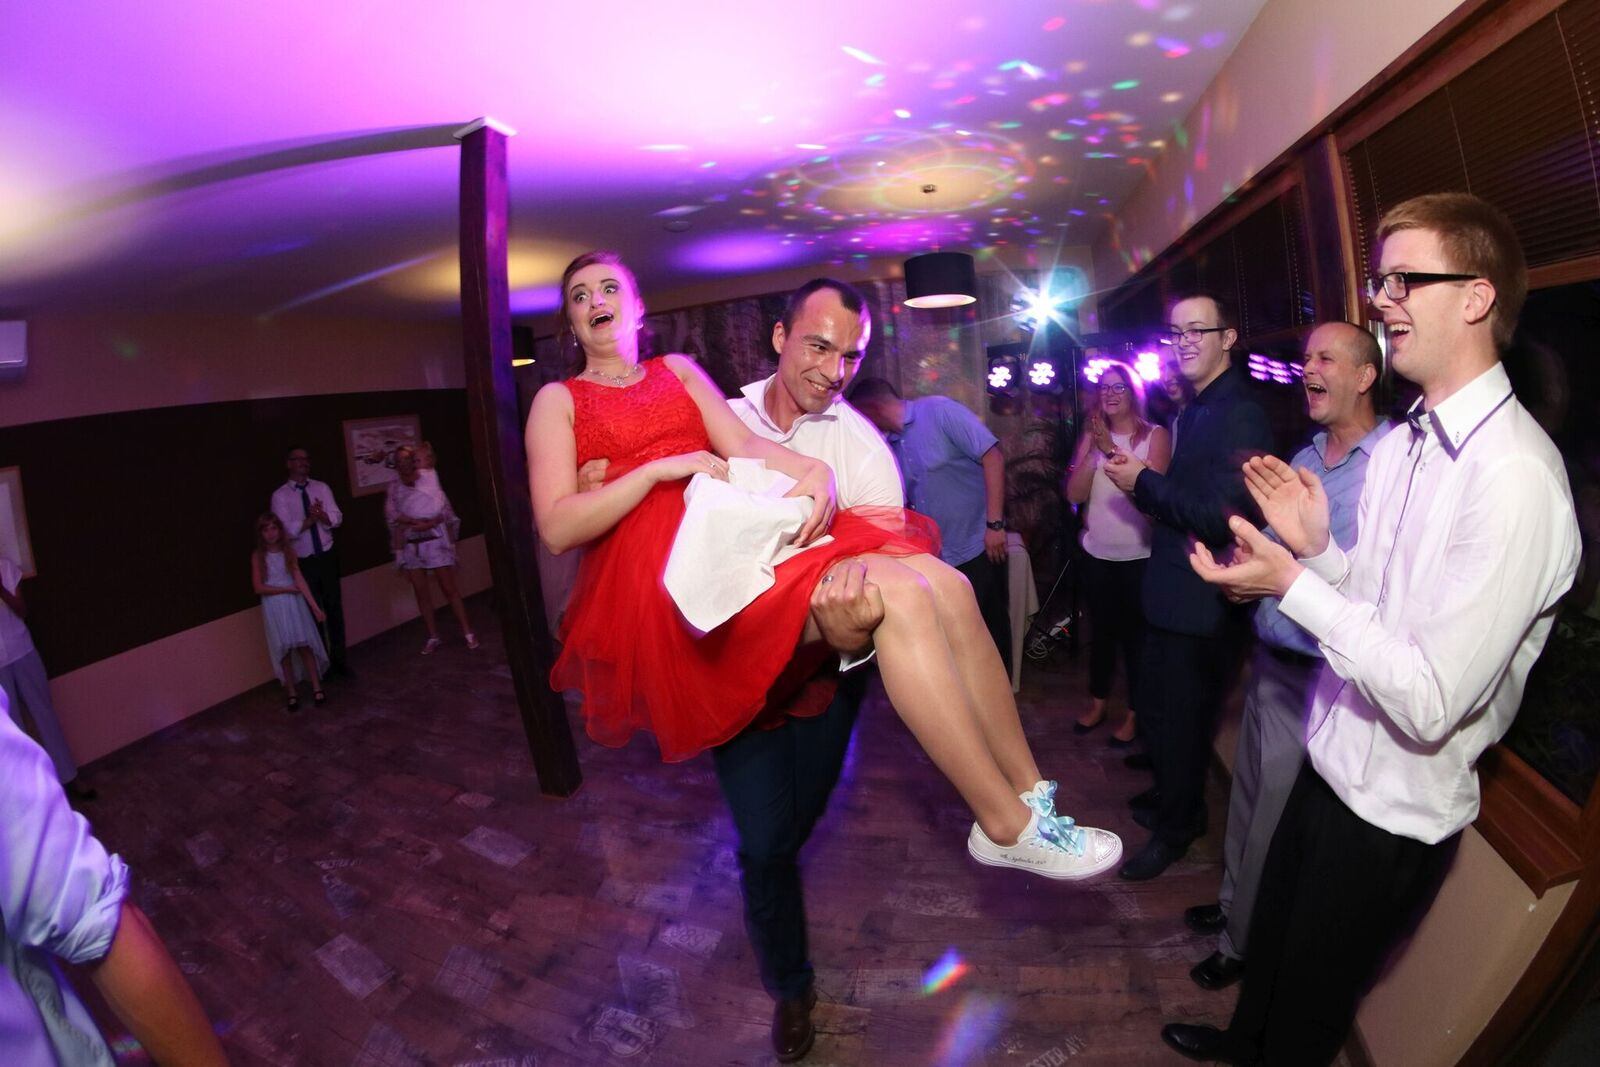 #Svadba Kaštieľ Betliar 02, #svadobný DJ, #svadba Betliar